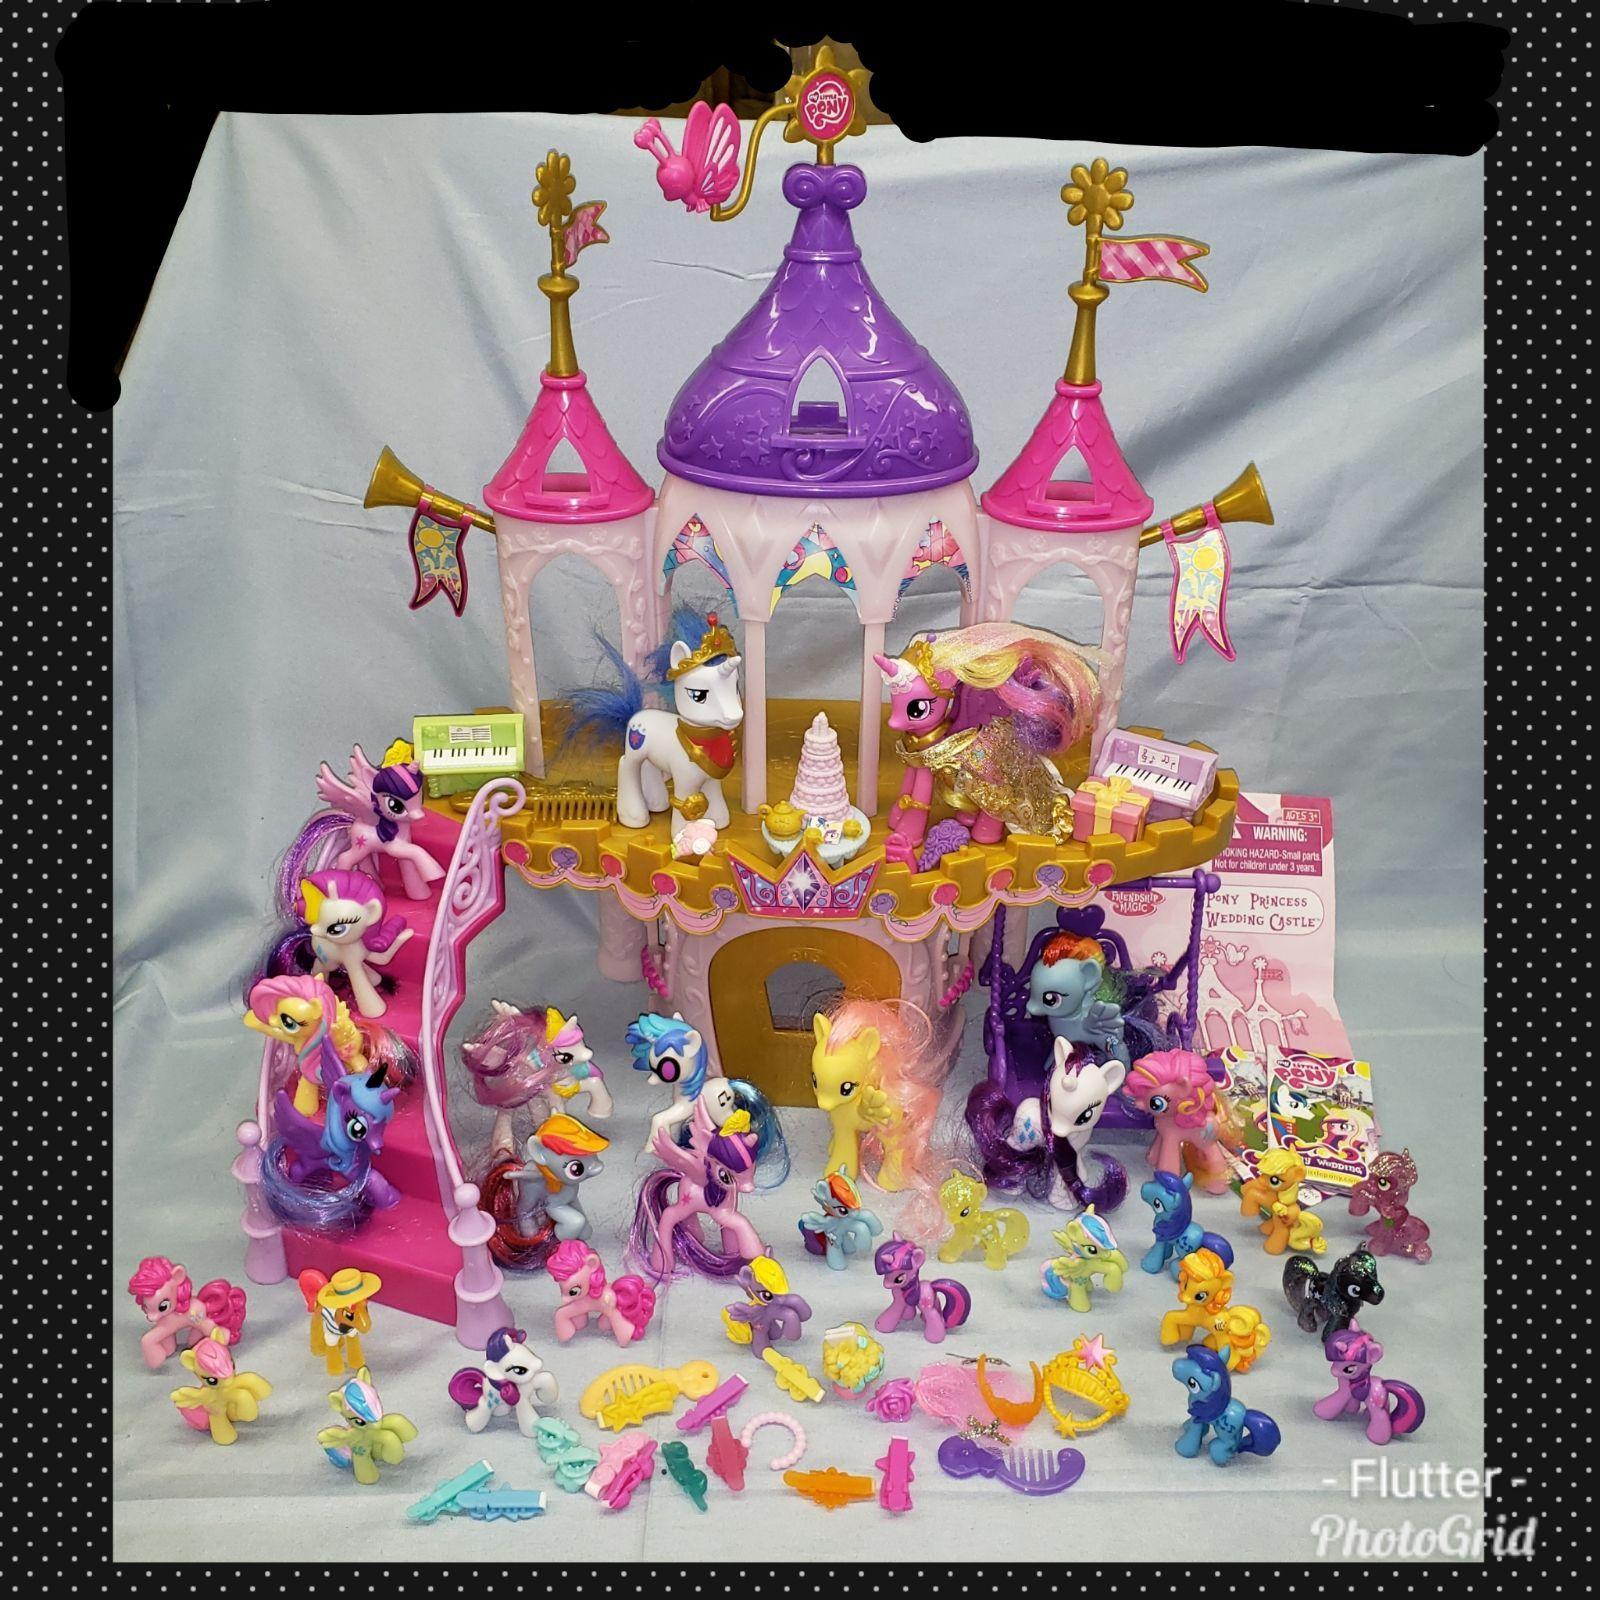 Huge Lot My Little Pony Wedding Castle Mercari In 2020 My Little Pony Poster My Little Pony Wallpaper My Little Pony